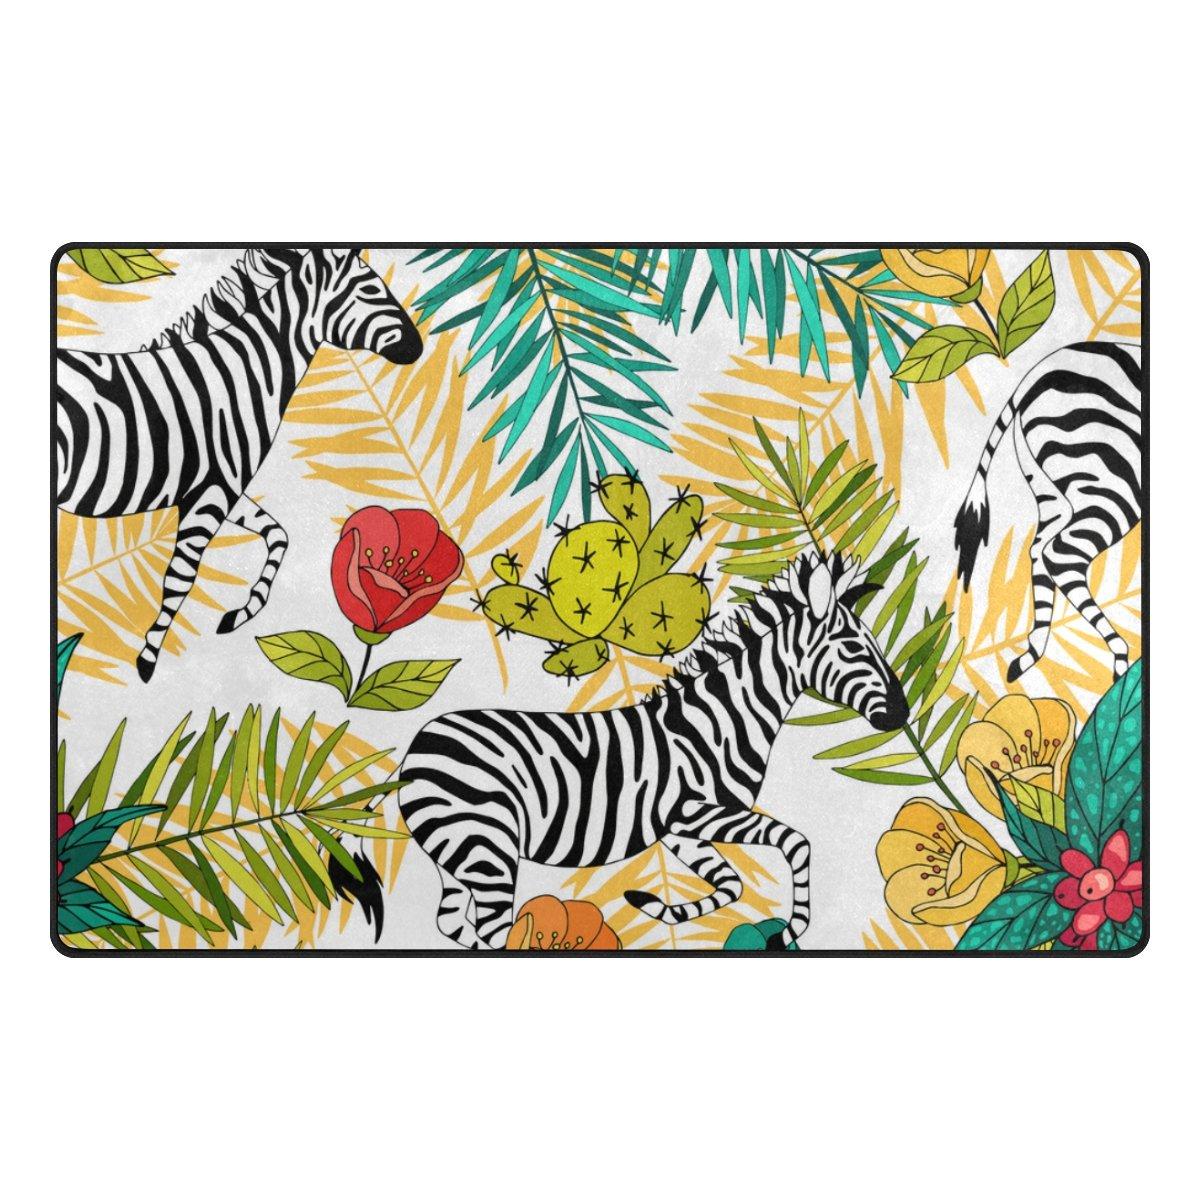 U LIFE Tropical Animal Zebra Striped Floral Flowers Large Doormats Area Rug Runner Floor Mat Carpet for Entrance Way Living Room Bedroom Kitchen Office 63 x 48 Inch